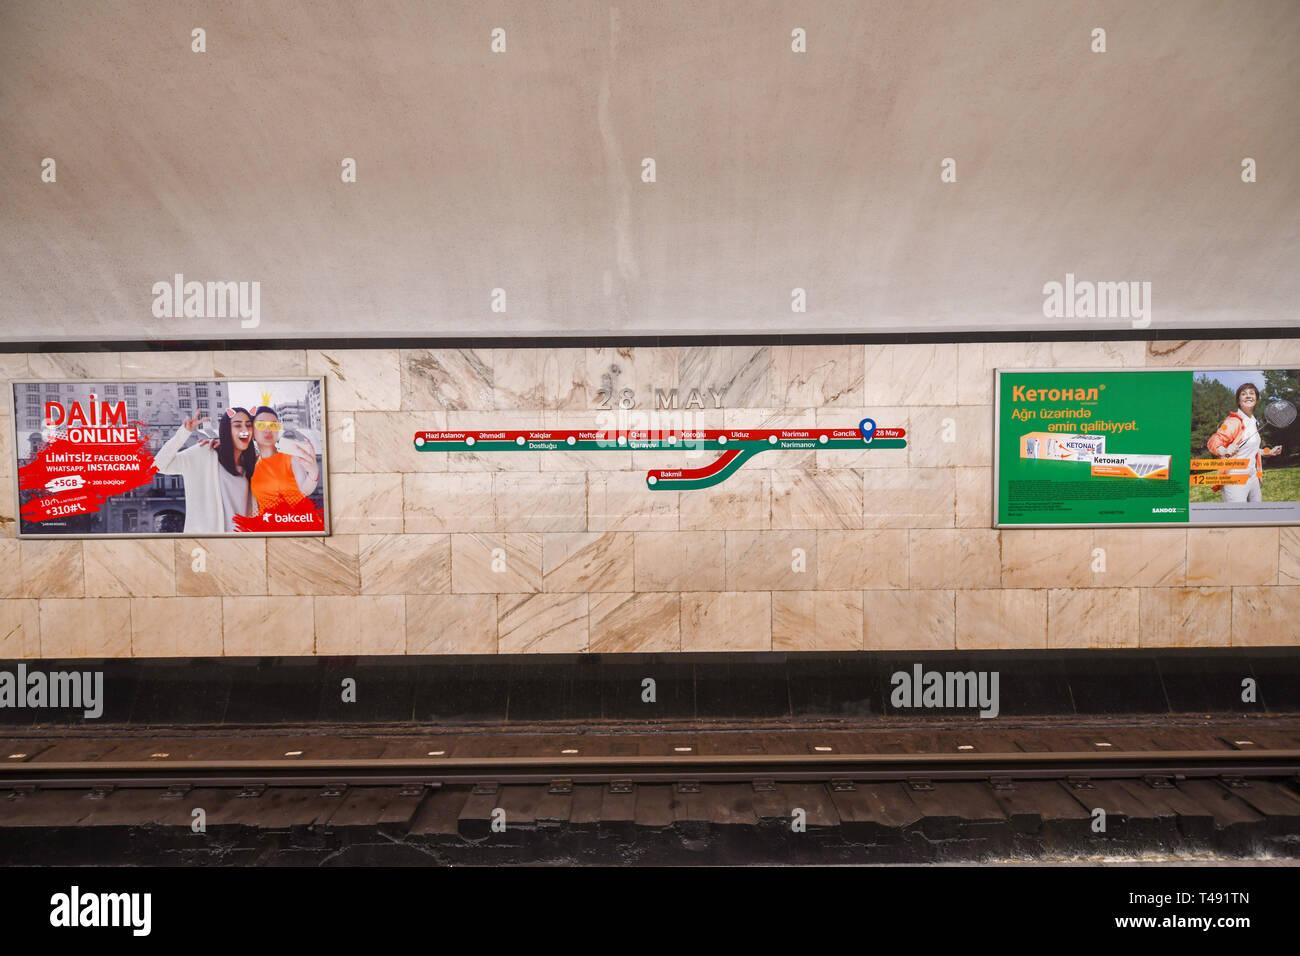 Baku, Azerbaijan - July 15, 2018: May 28 Metro station in the city of Baku, Azerbaijan. - Stock Image